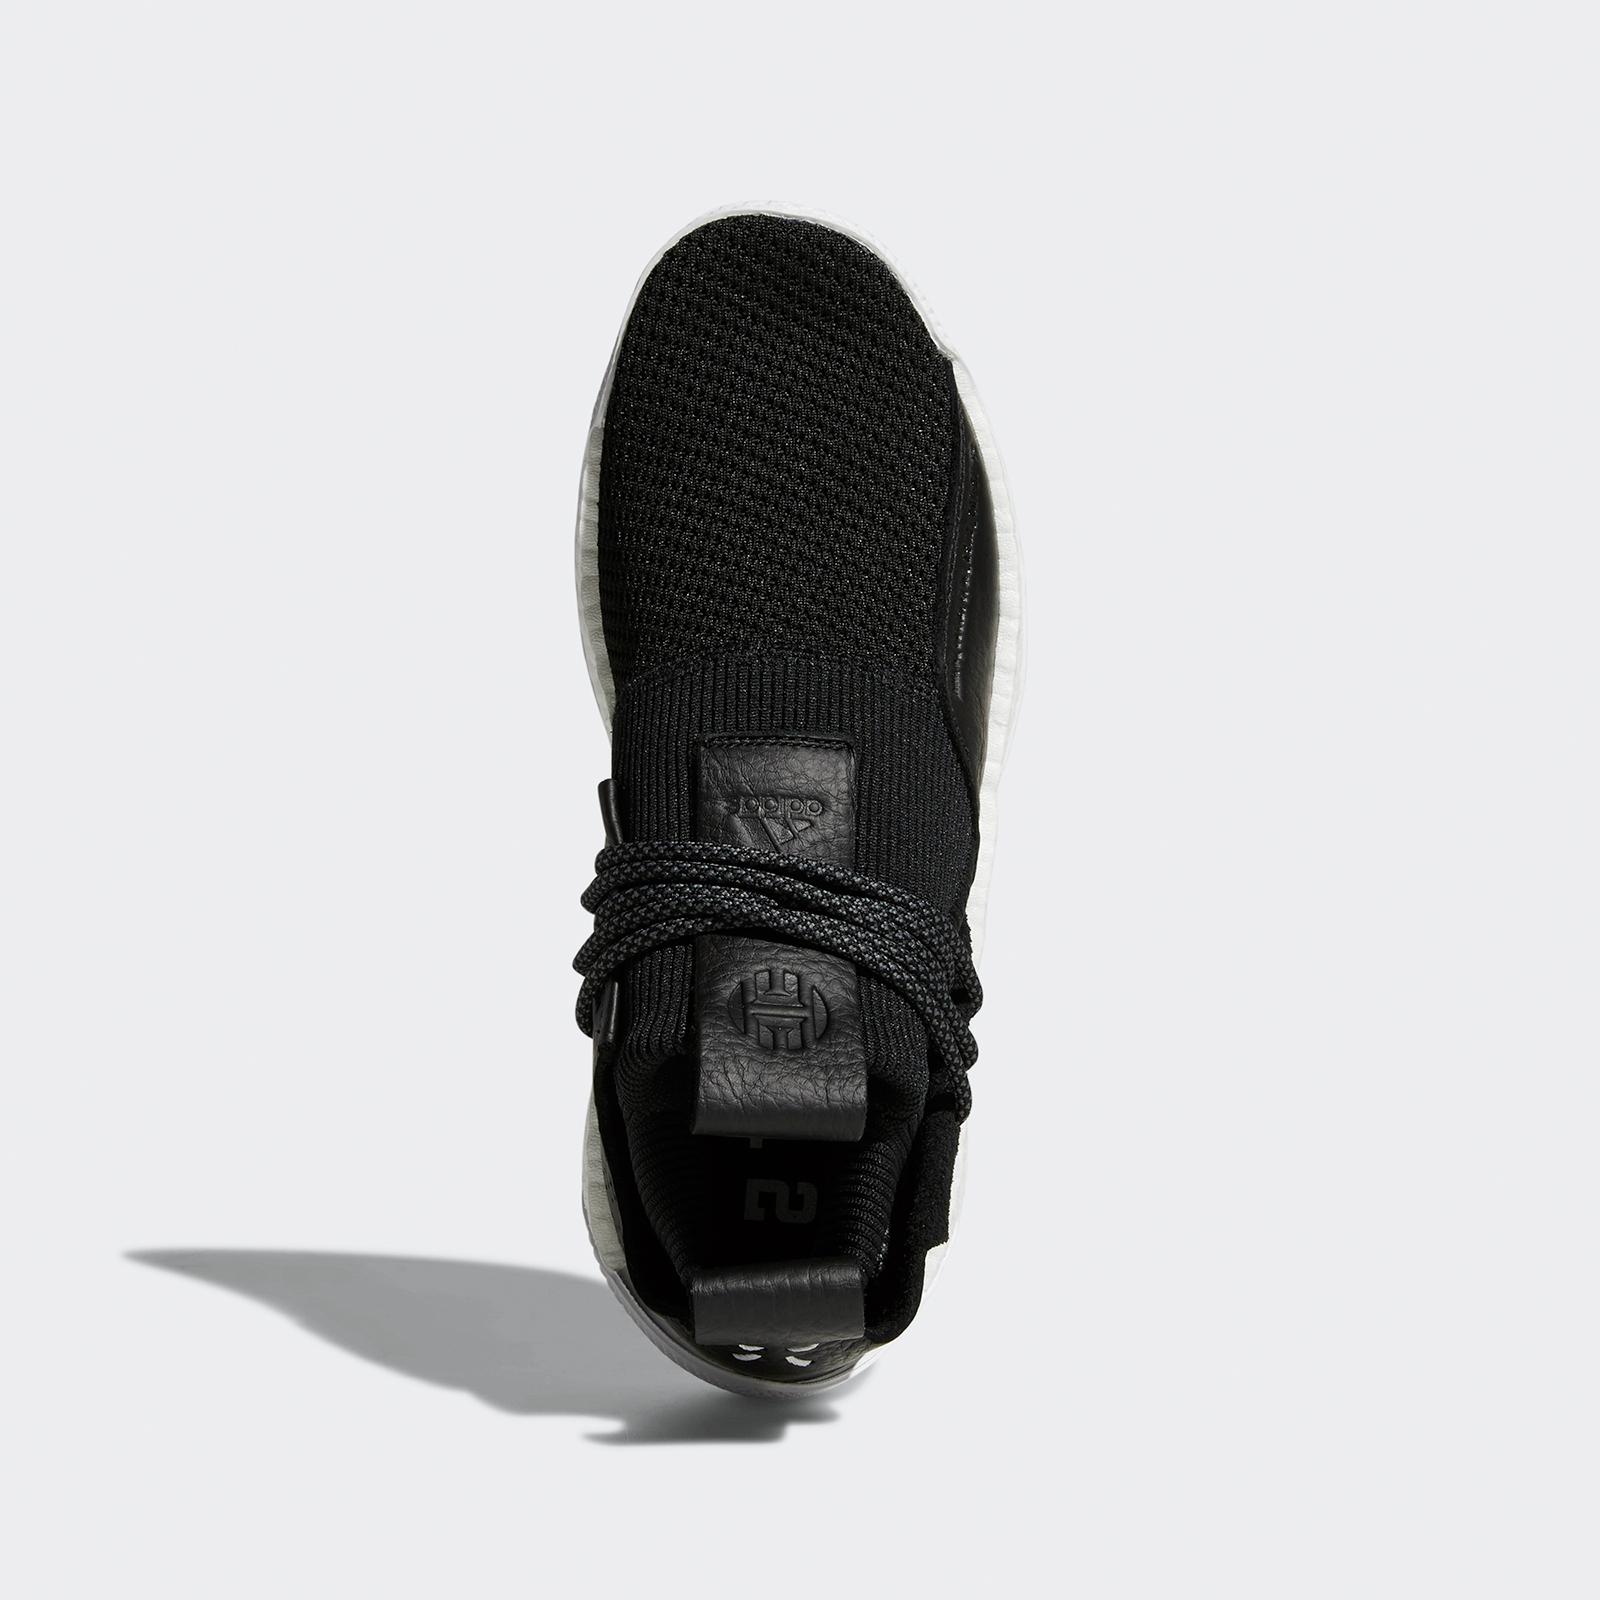 c740e8f993bc adidas Harden LS 2 Lace - Bb7651 - Sneakersnstuff